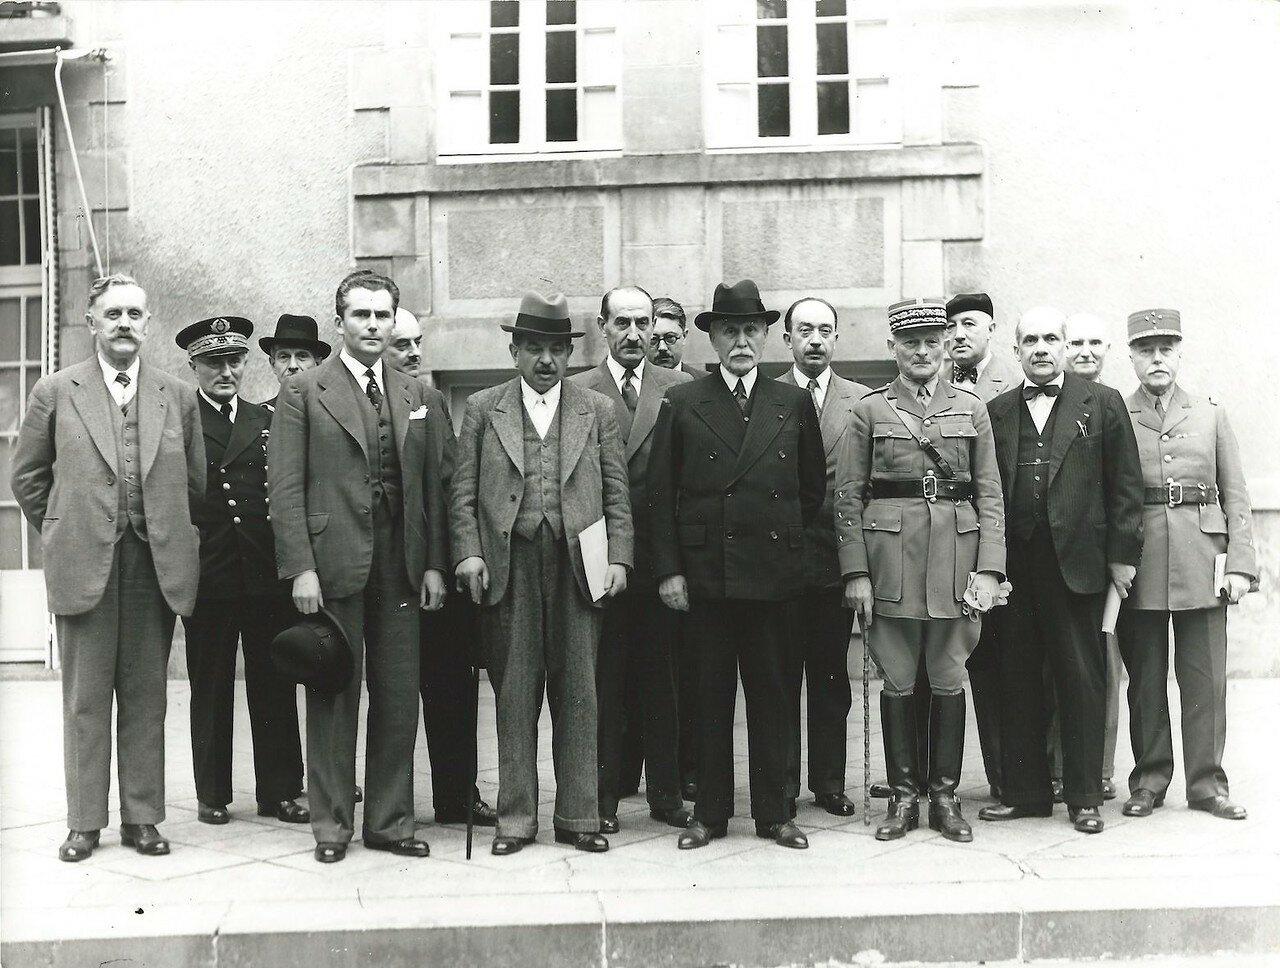 11 июня 1940. Правительство Виши. Франсуа Дарлан, Пьер Лаваль, Эмиль Мирье, Максим Вейган